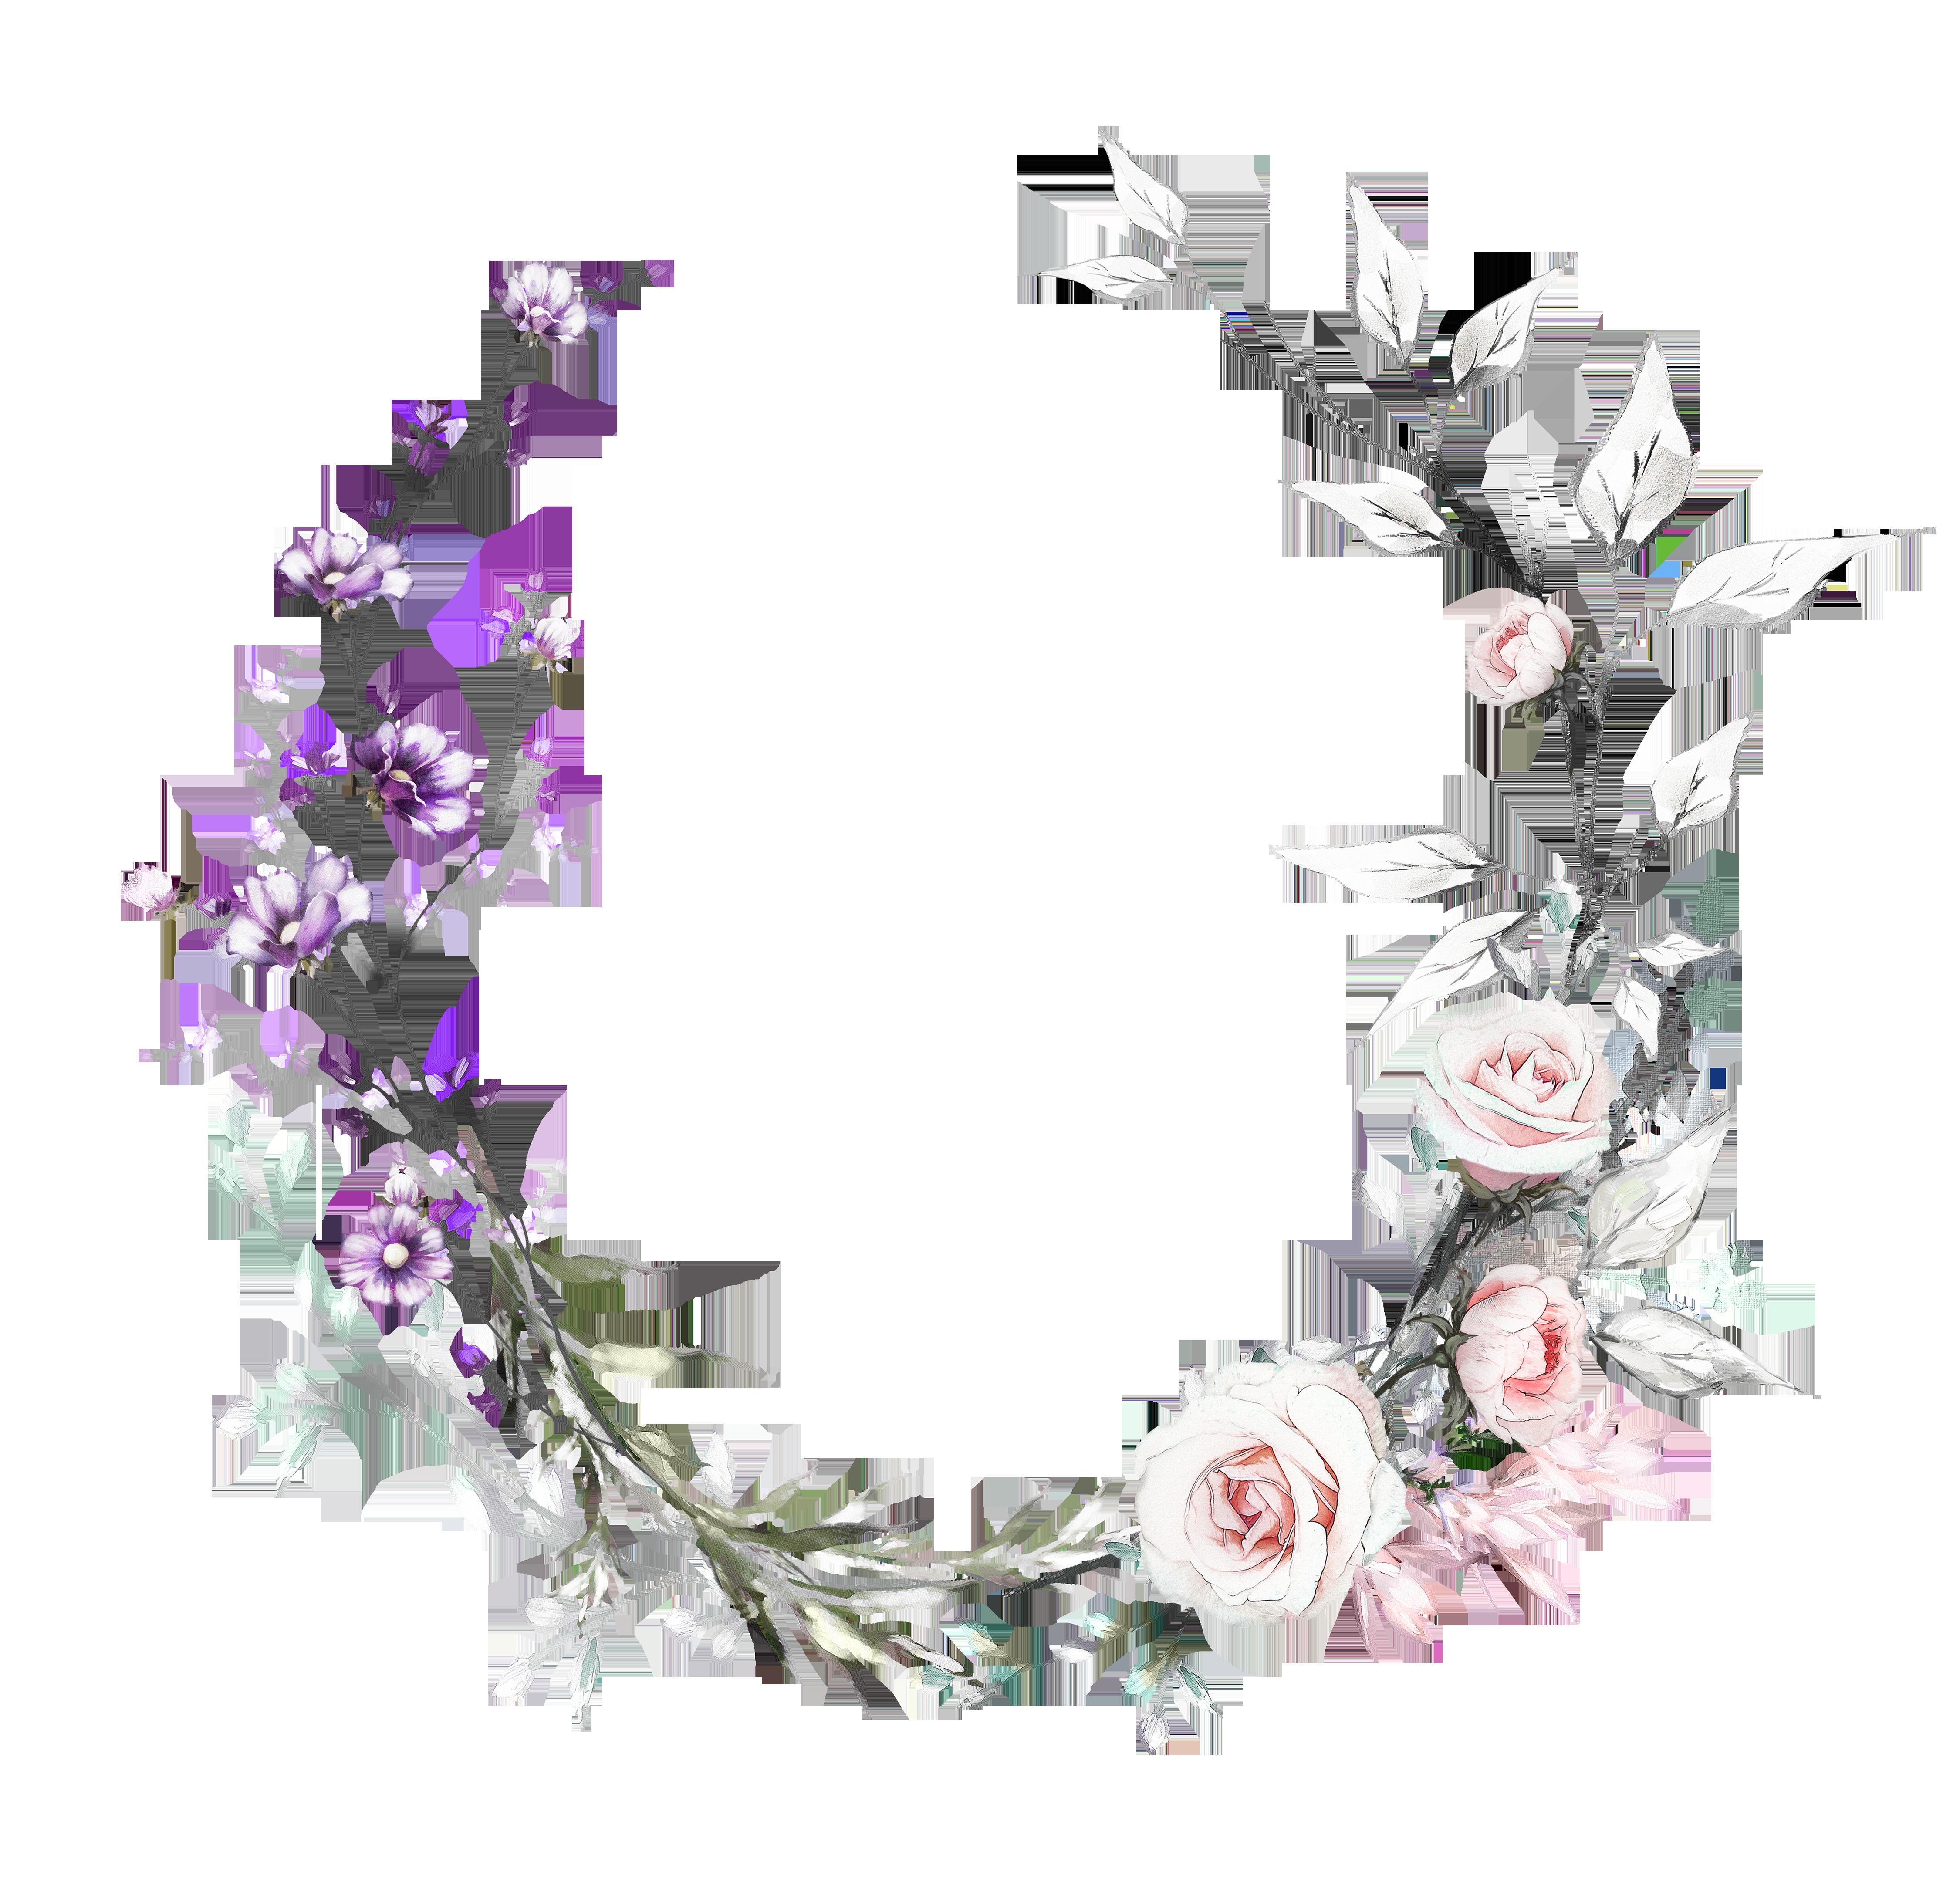 H927 (30) Flower frame, Flower drawing, Floral watercolor